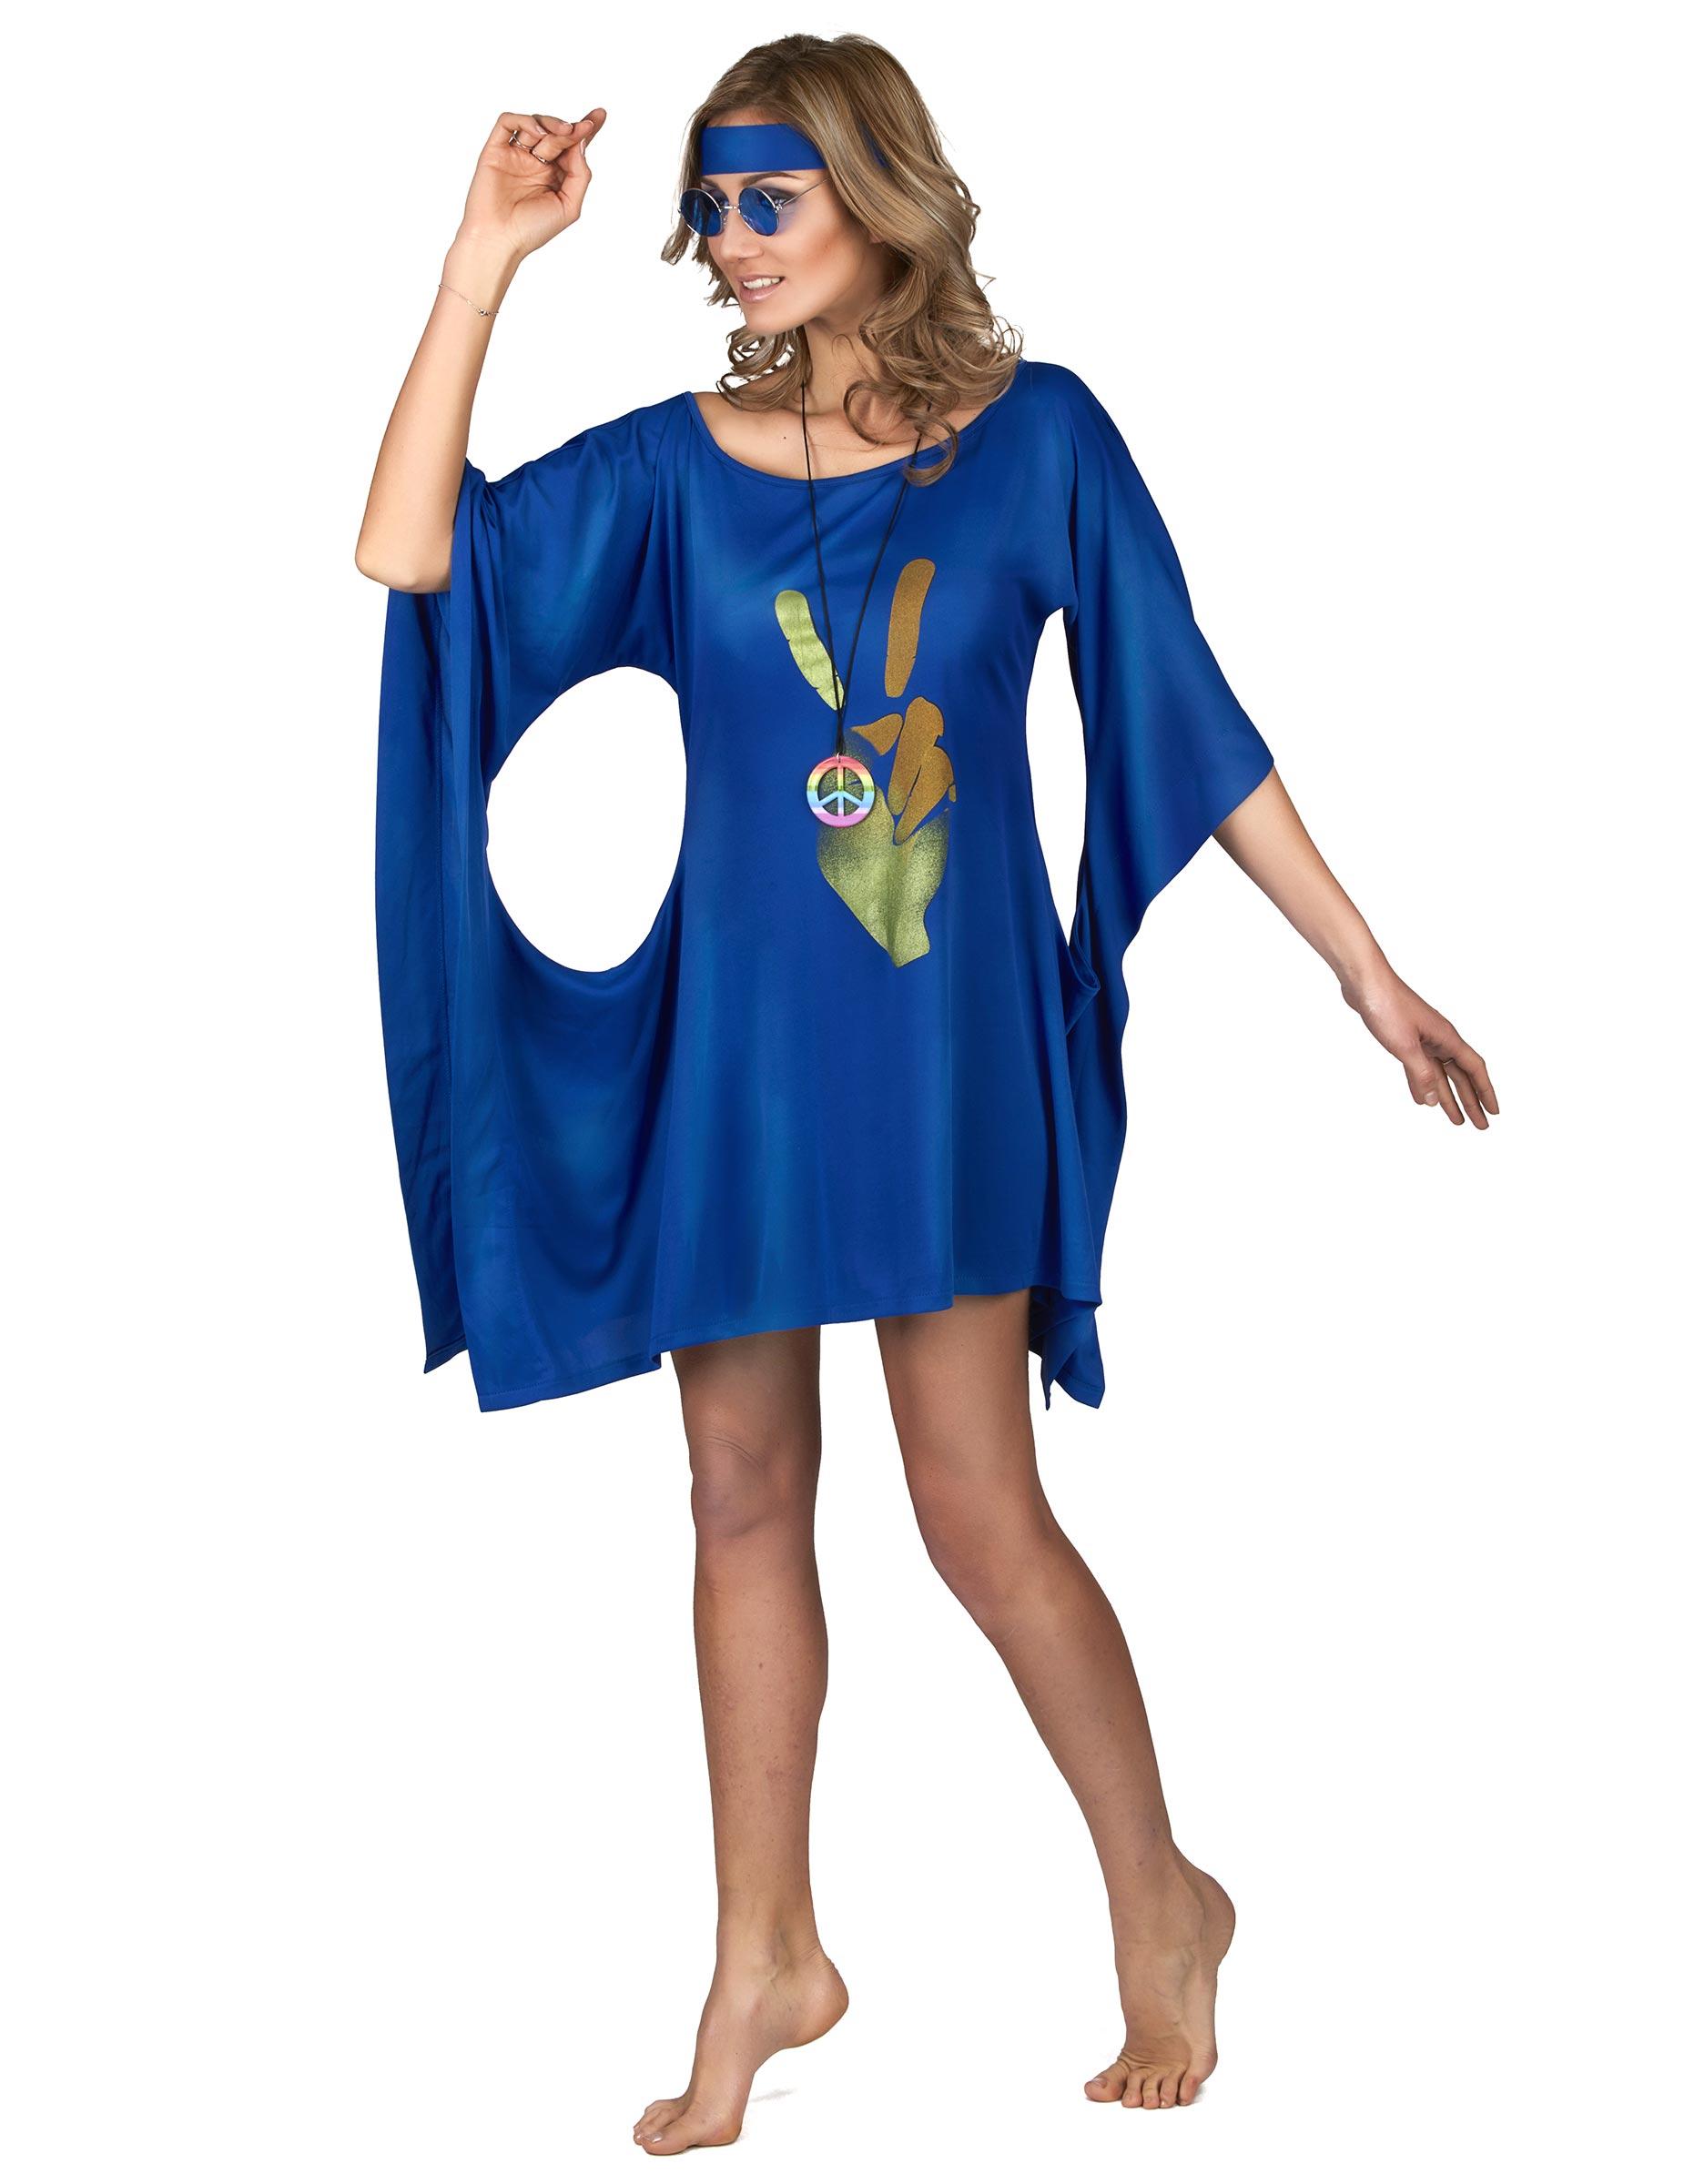 9faf08695065 deguisement-robe-hippie-bleue-peace-love-femme 238806 4.jpg